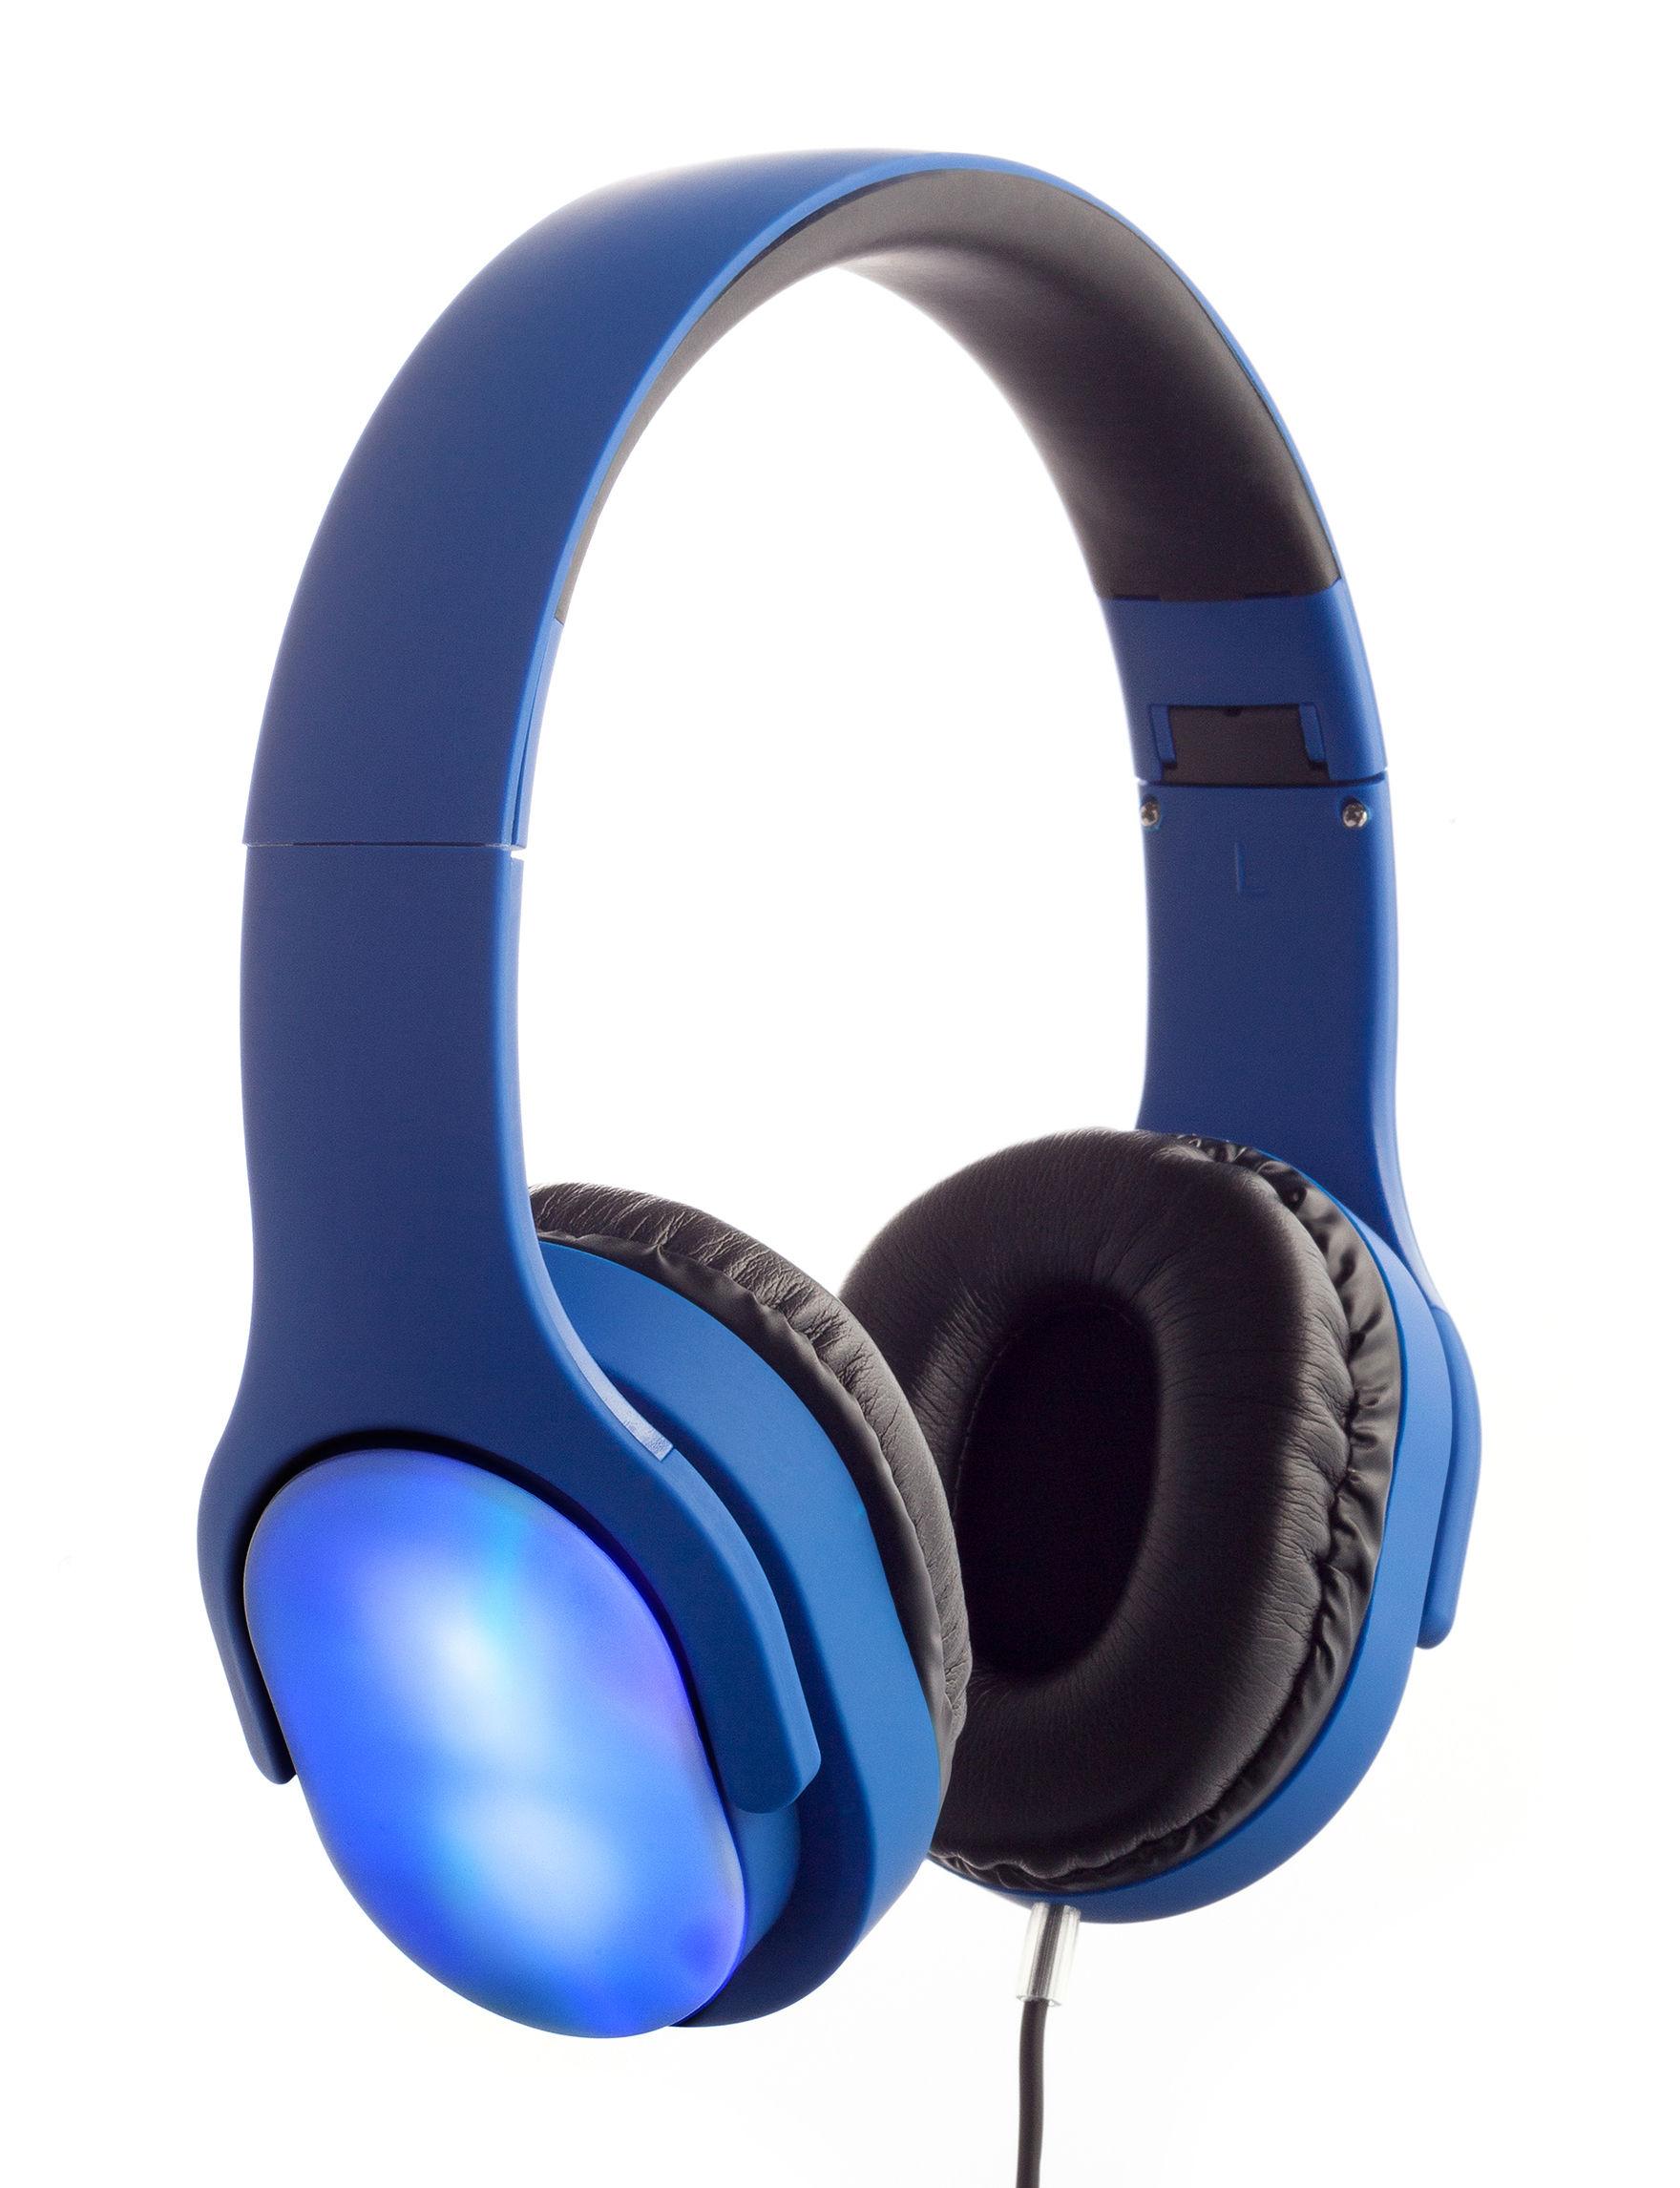 Vivitar White Headphones